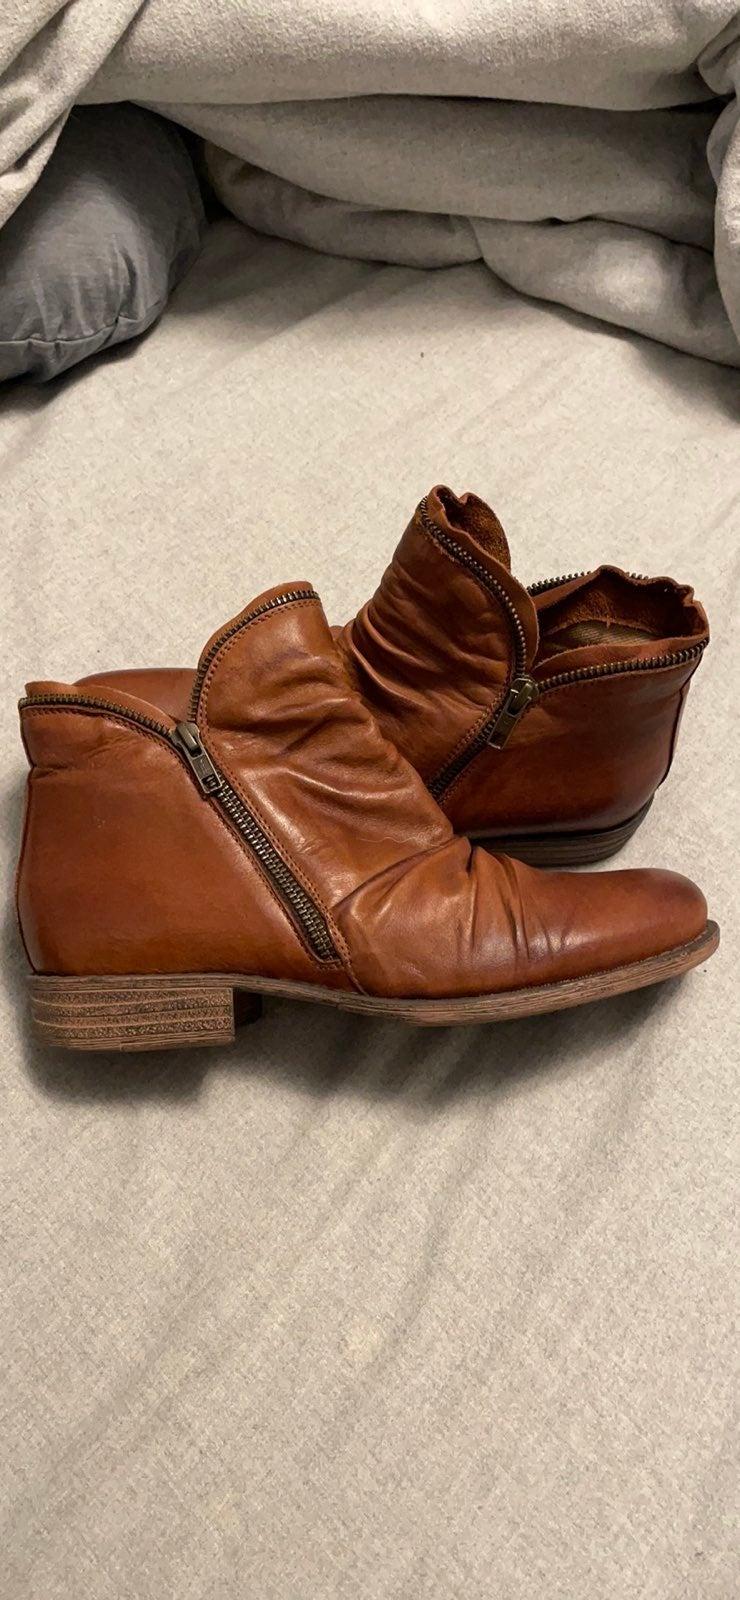 Miz Mooz Luna ankle boots in brandy, siz